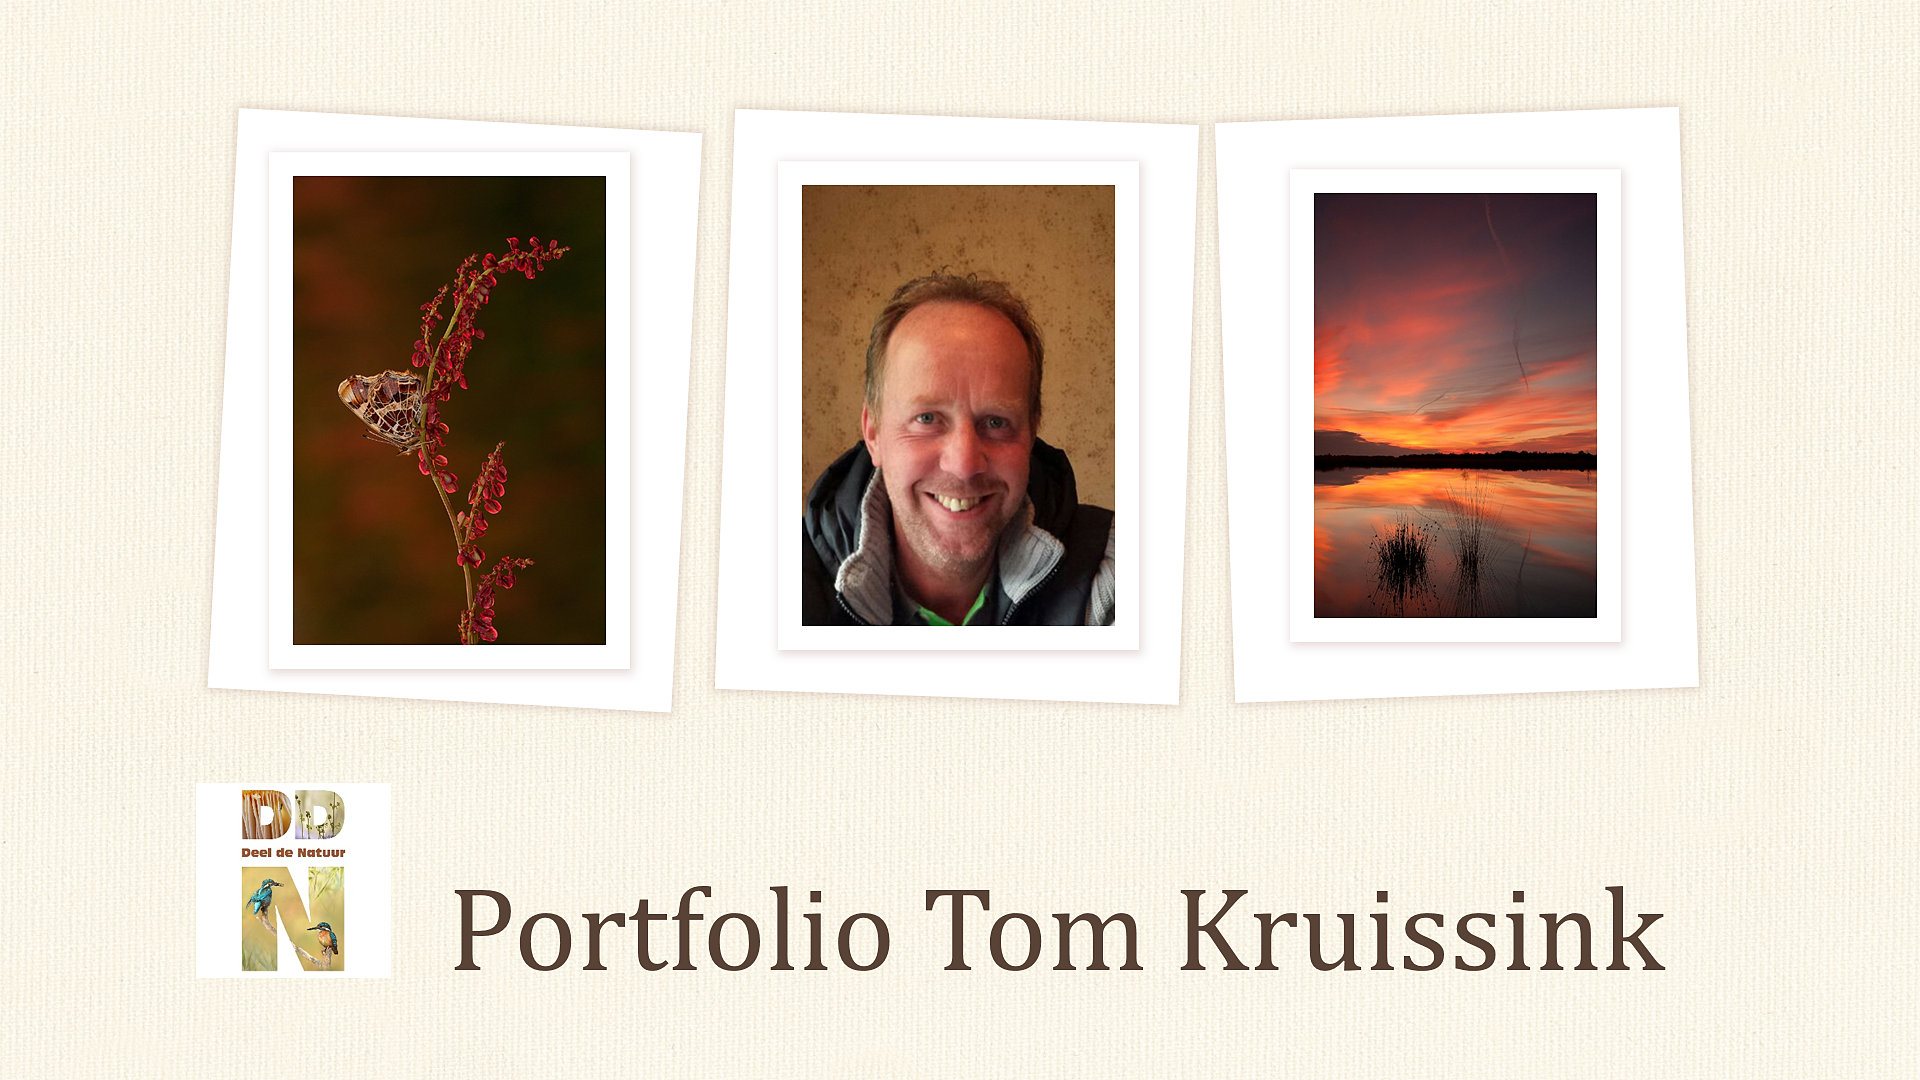 Portfolio Tom Kruissink Spotlight